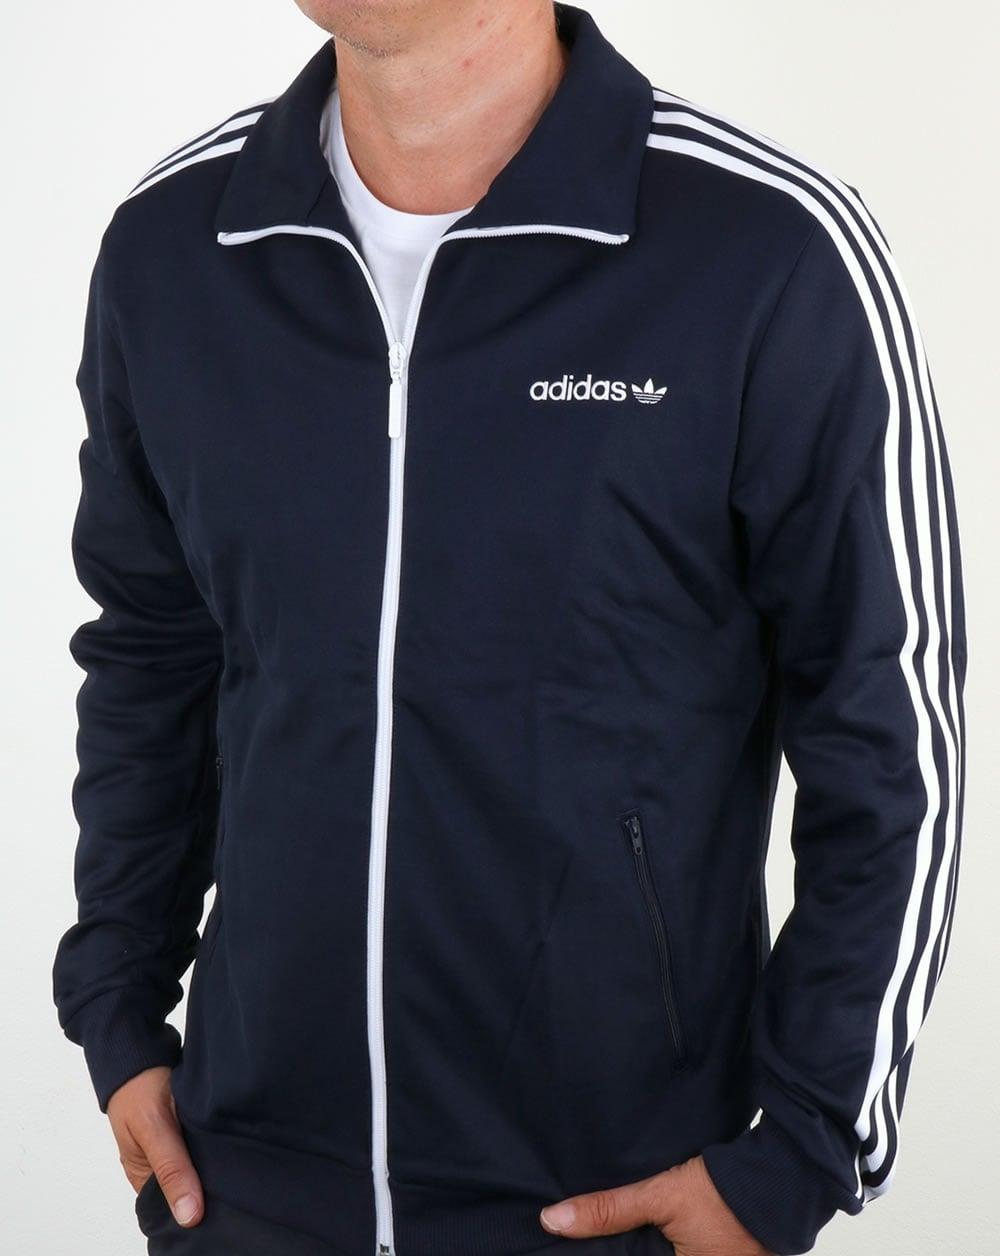 Jacke adidas beckenbauer